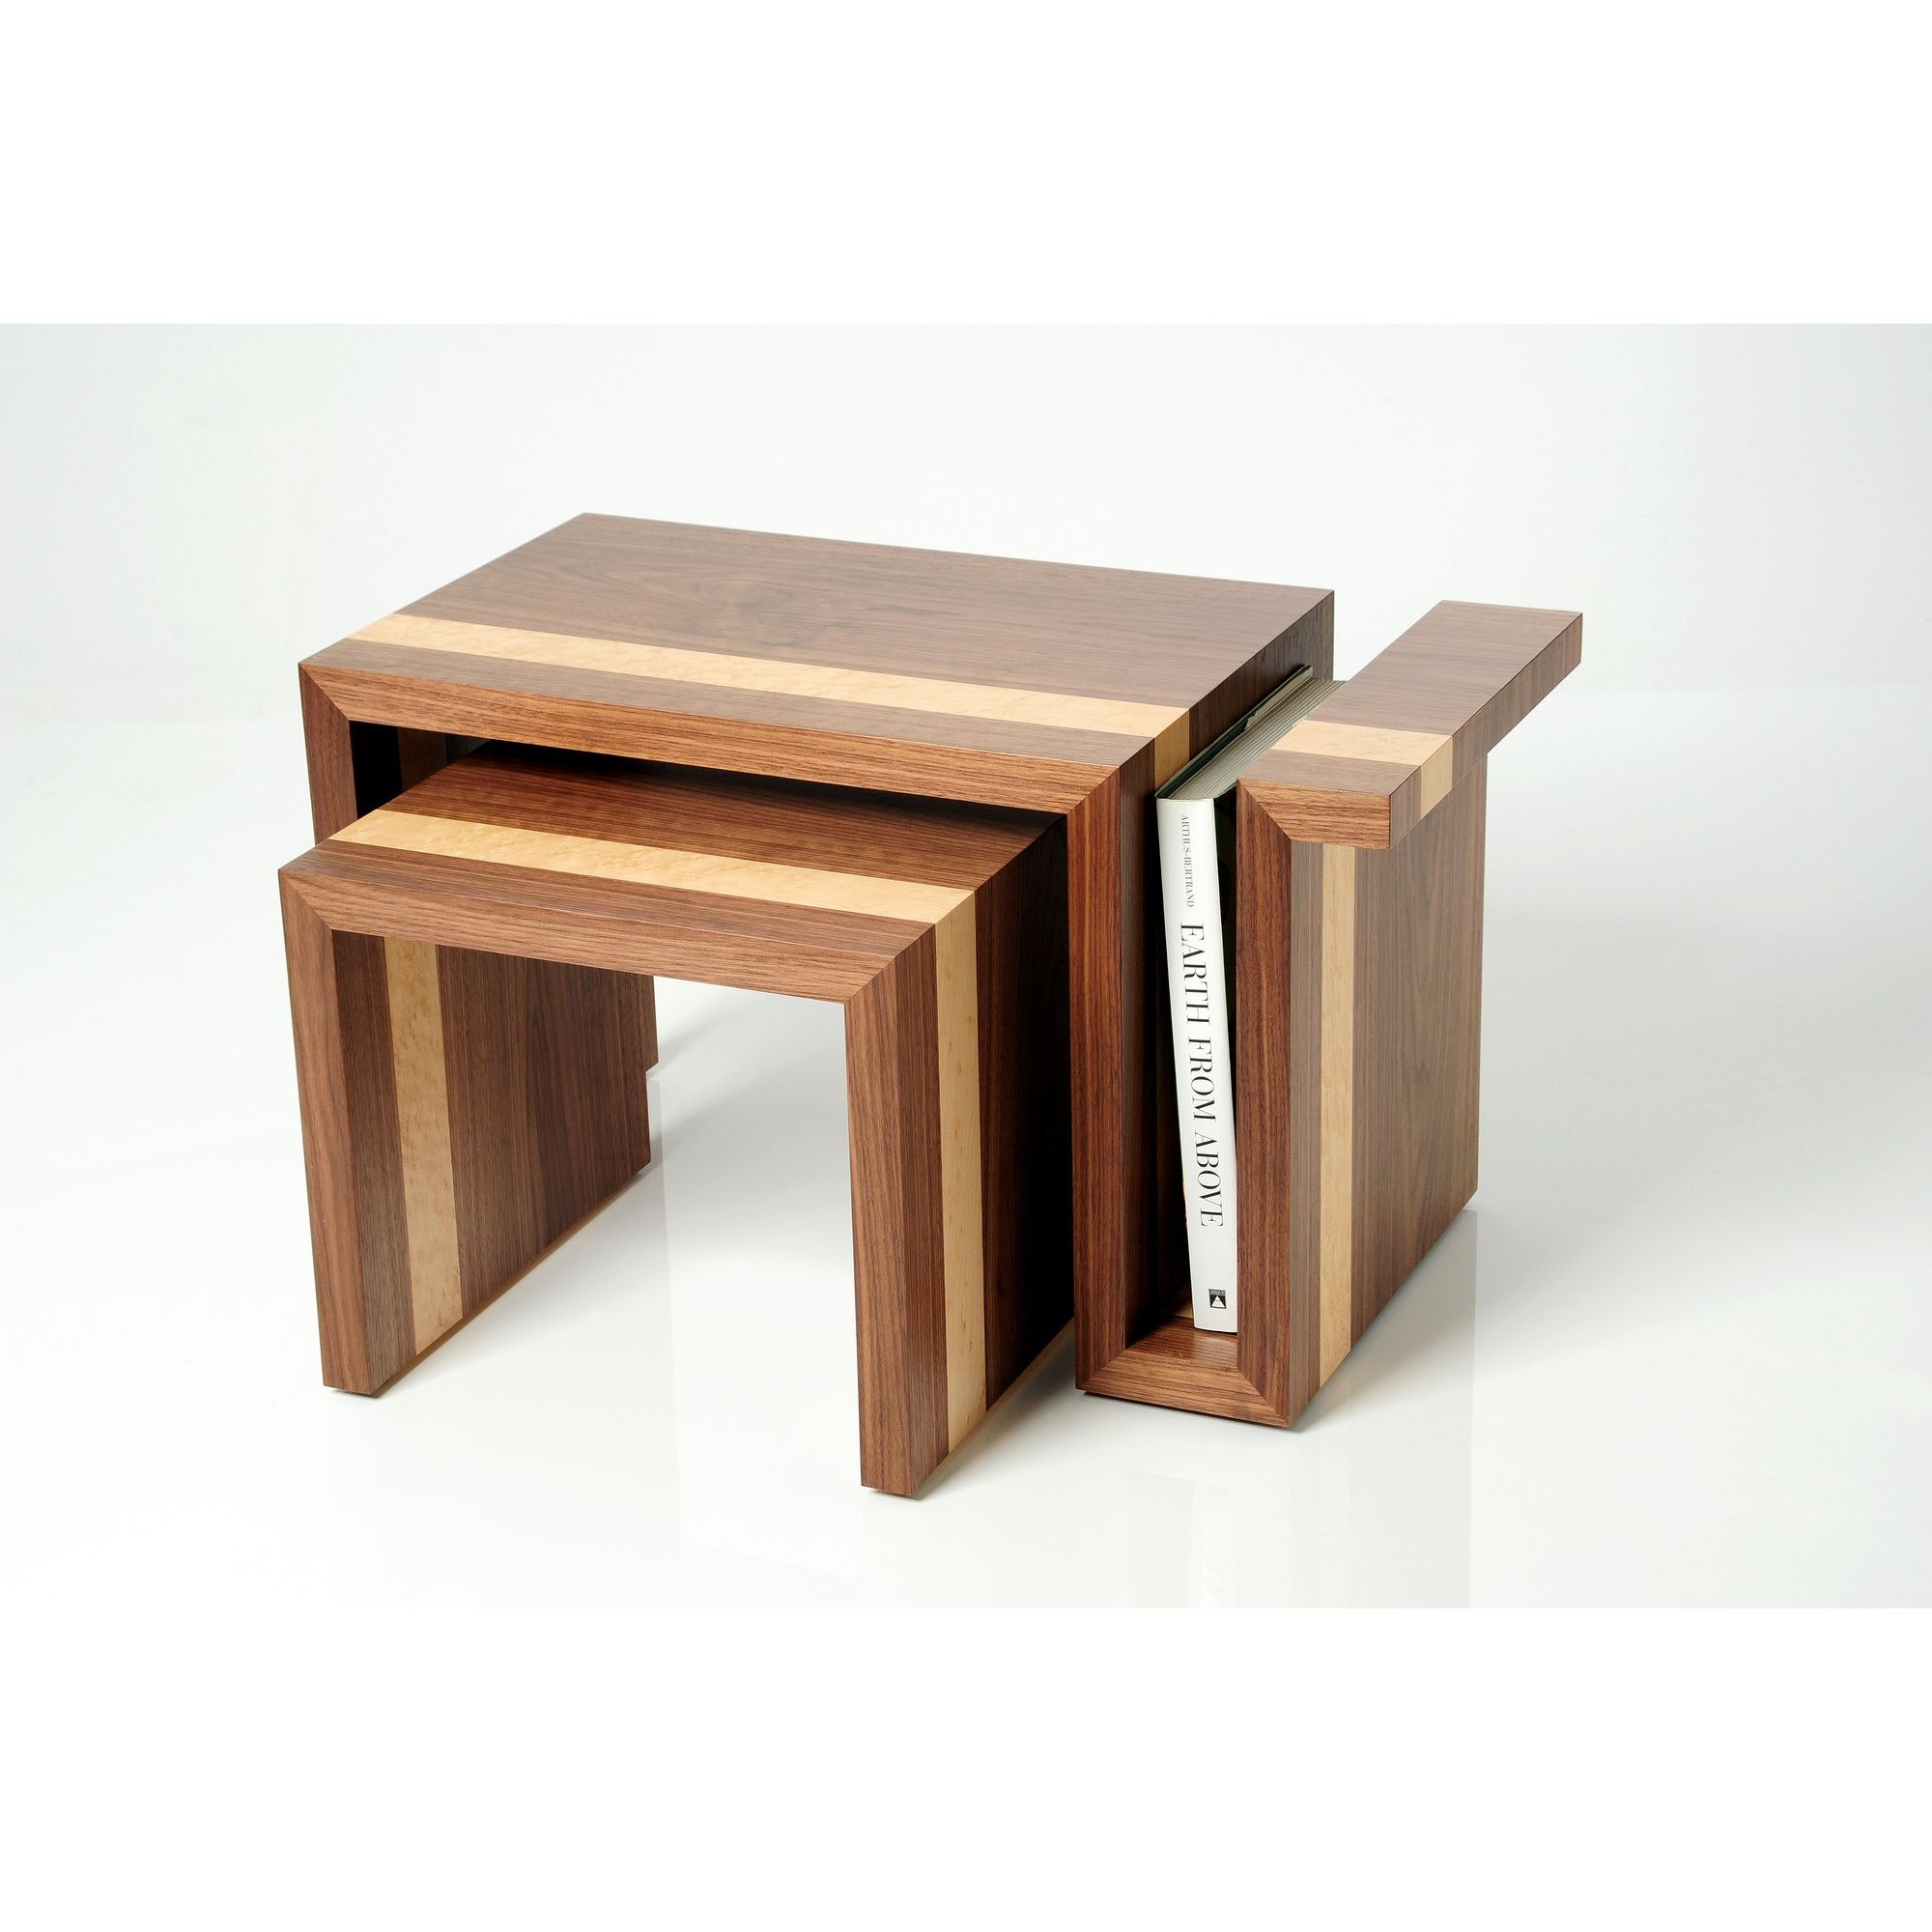 Trefurn Revival Nest Coffee Table - Fumed Oak at Tesco Direct